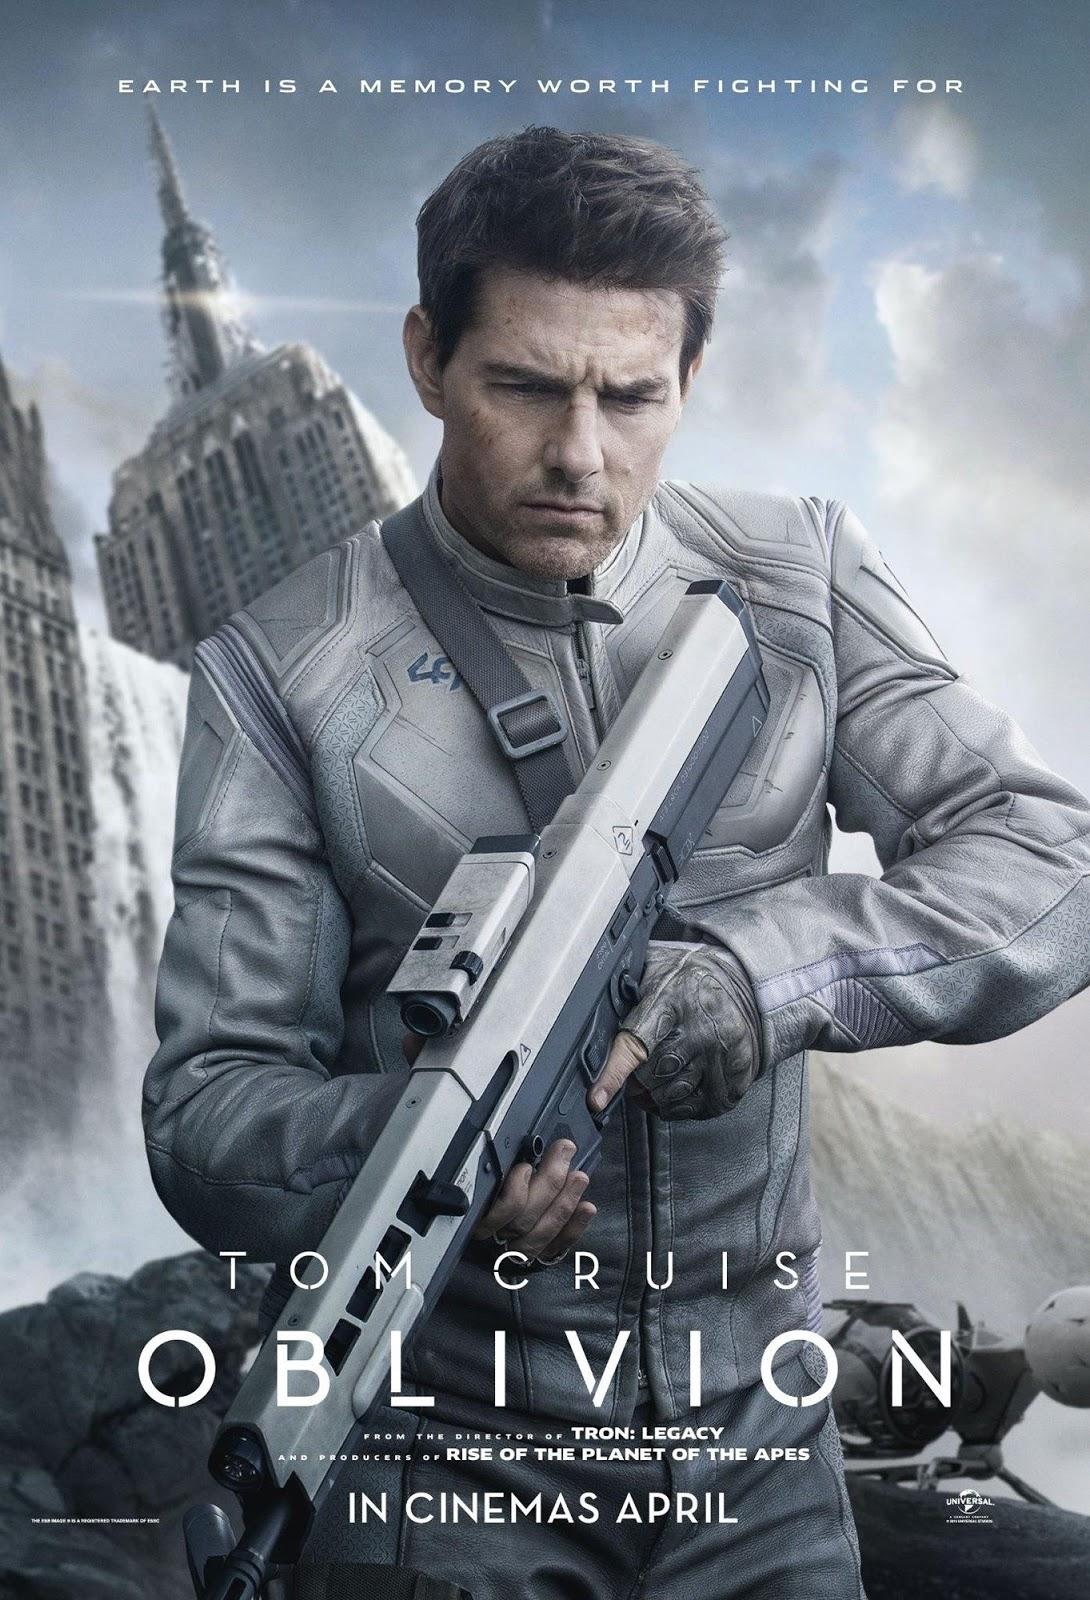 http://3.bp.blogspot.com/-irzFS1mz600/UWph7ElJCtI/AAAAAAAAEo0/eZ_47bBfO2E/s1600/oblivion+2013+movie+poster.jpg